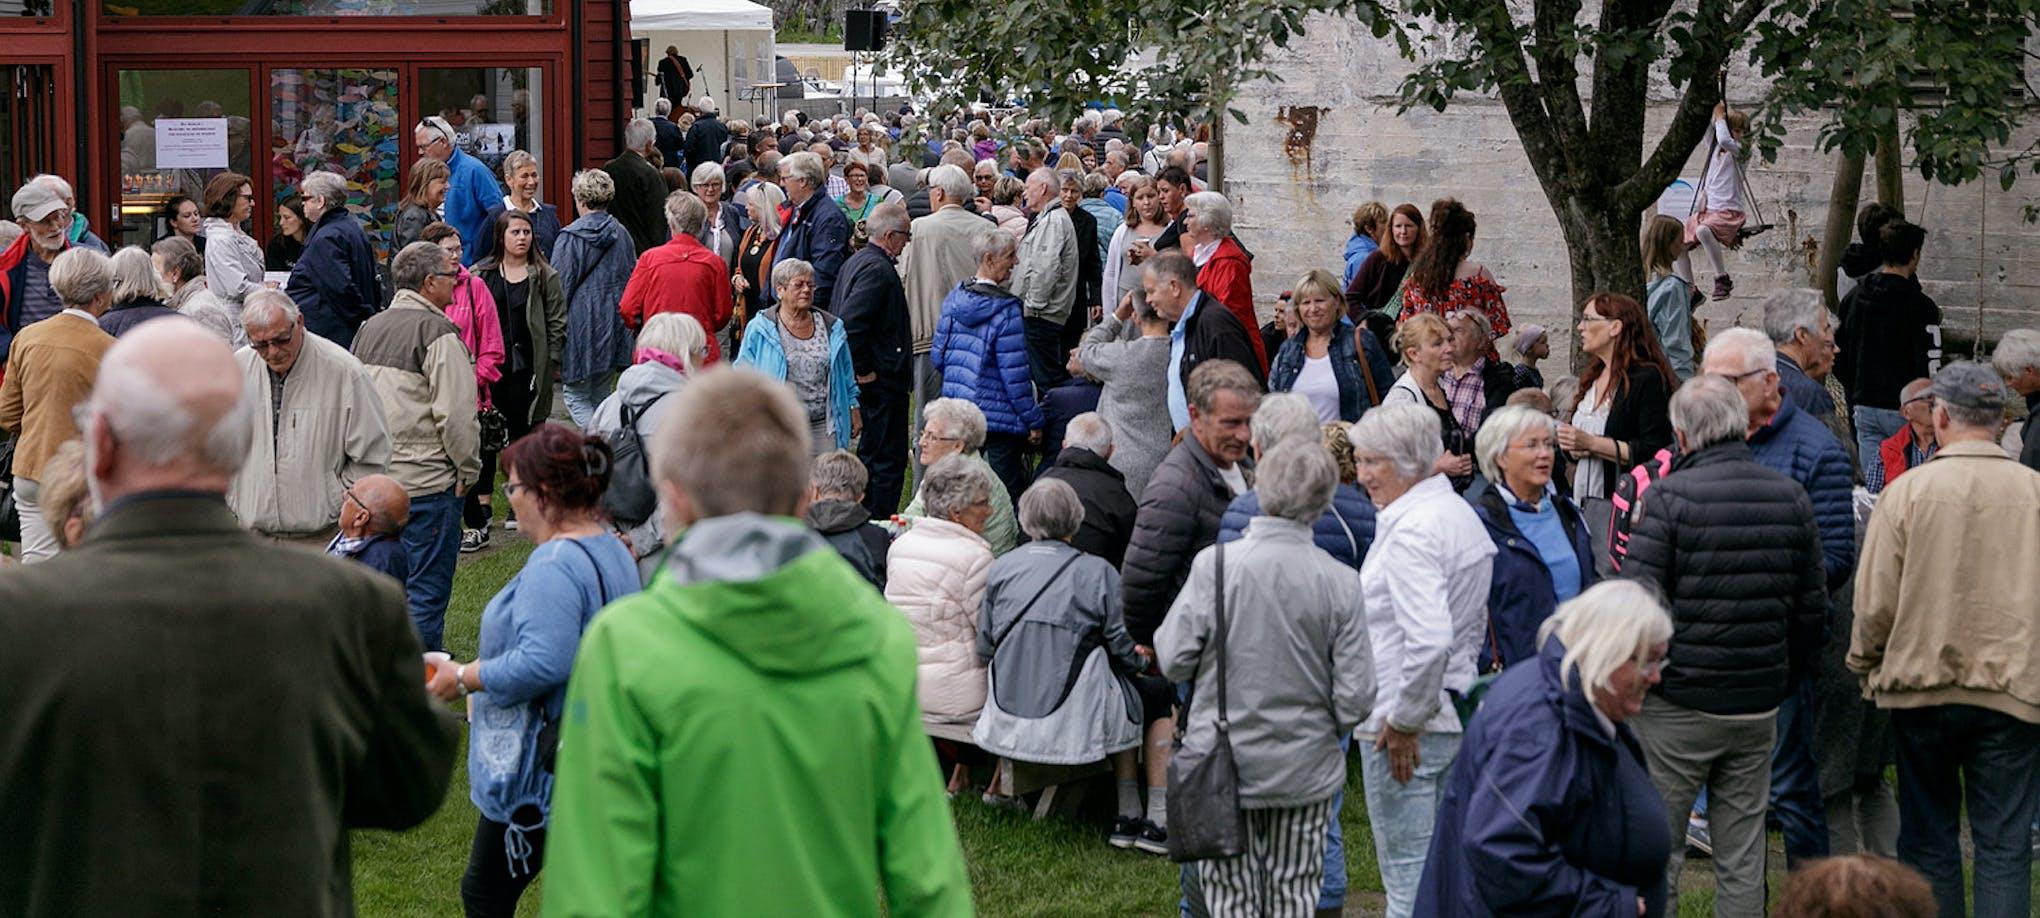 Museumsjazz i Dokken. *** Local Caption *** Publikum